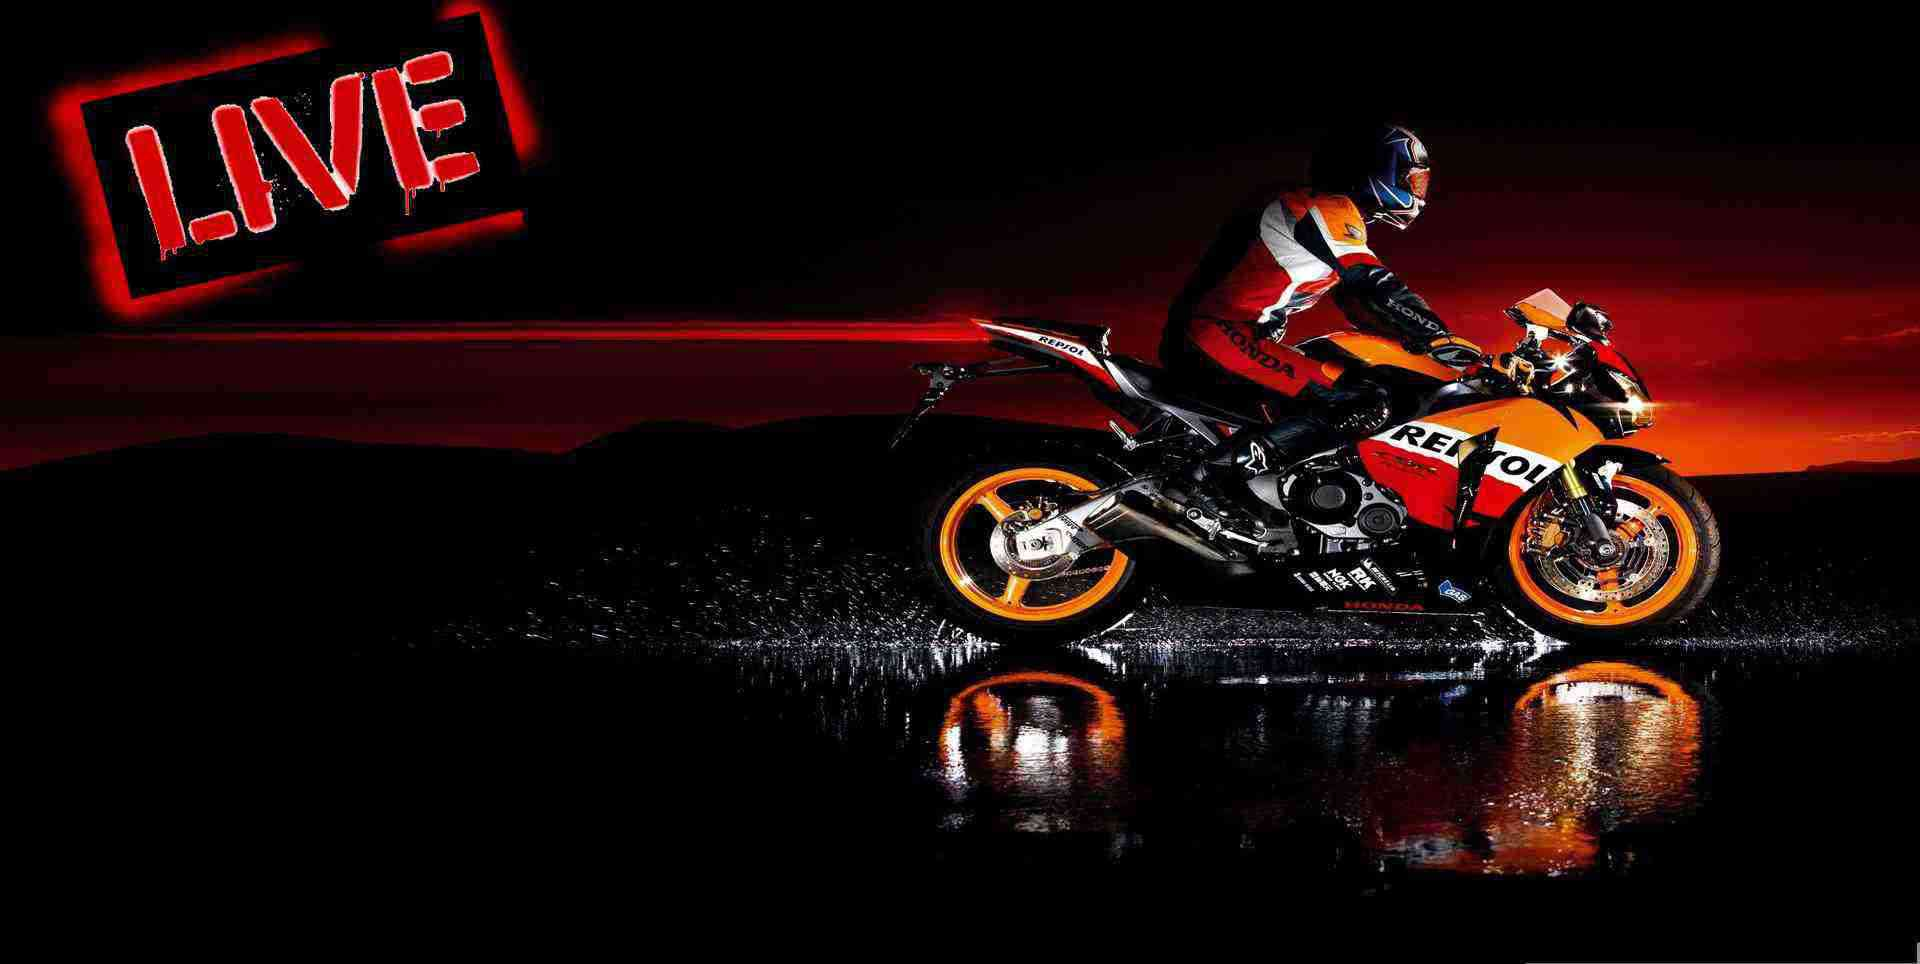 argentina-moto-gp-2018-grand-prix-live